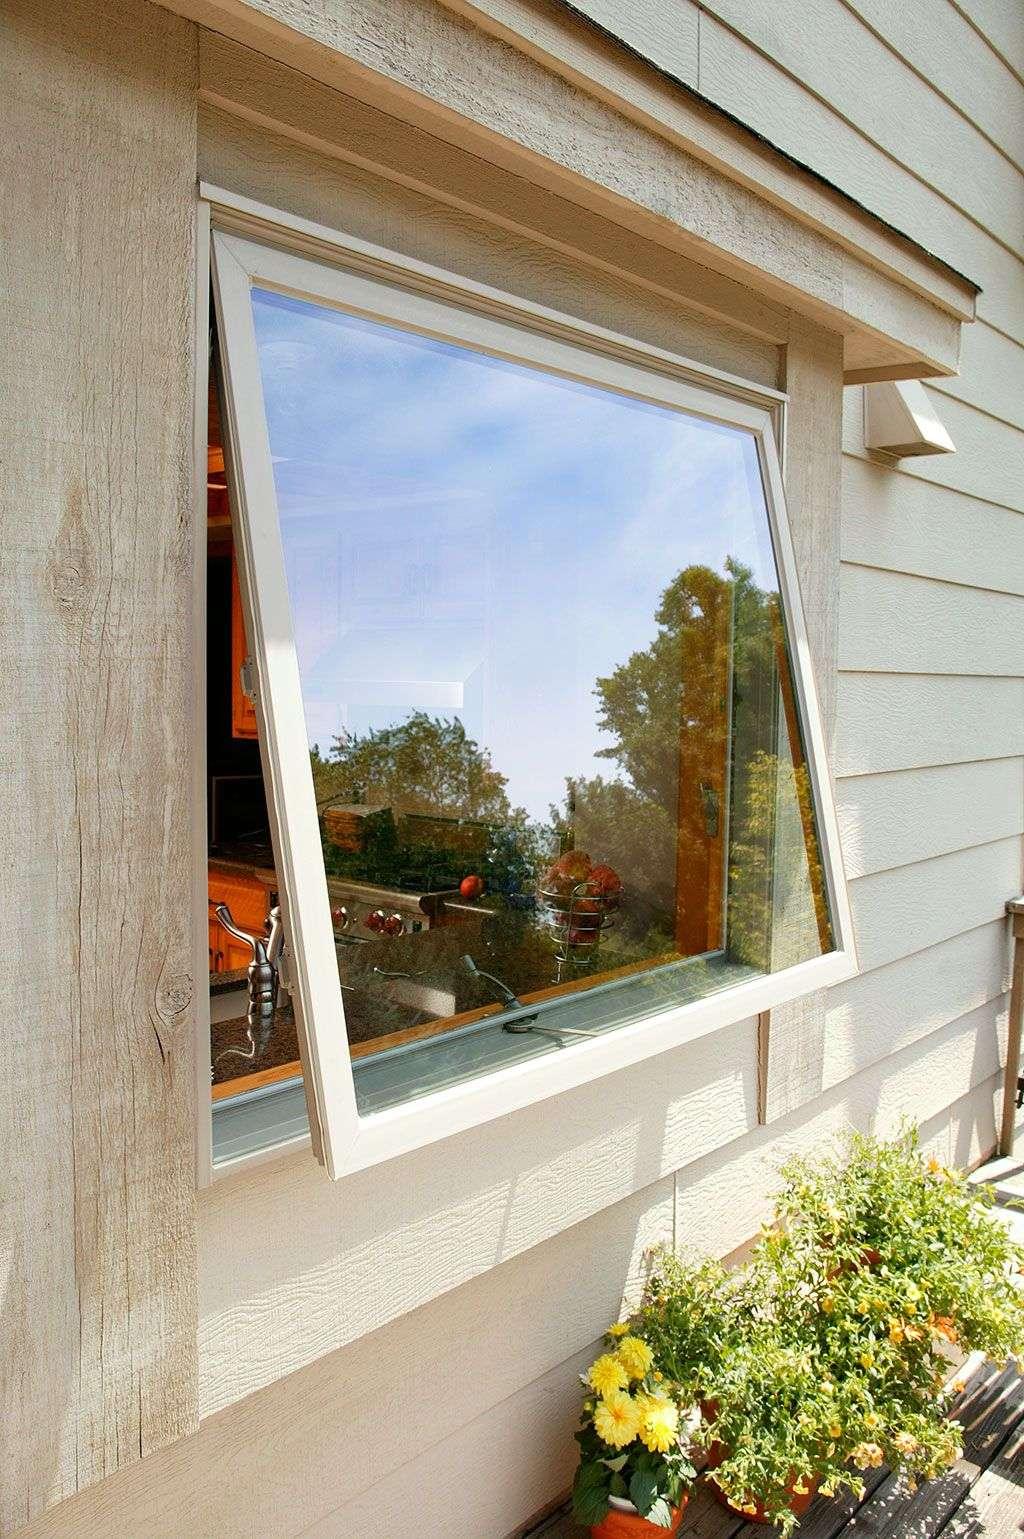 andersen kitchen windows small islands top hung & side – prayosha enterprise ltd.